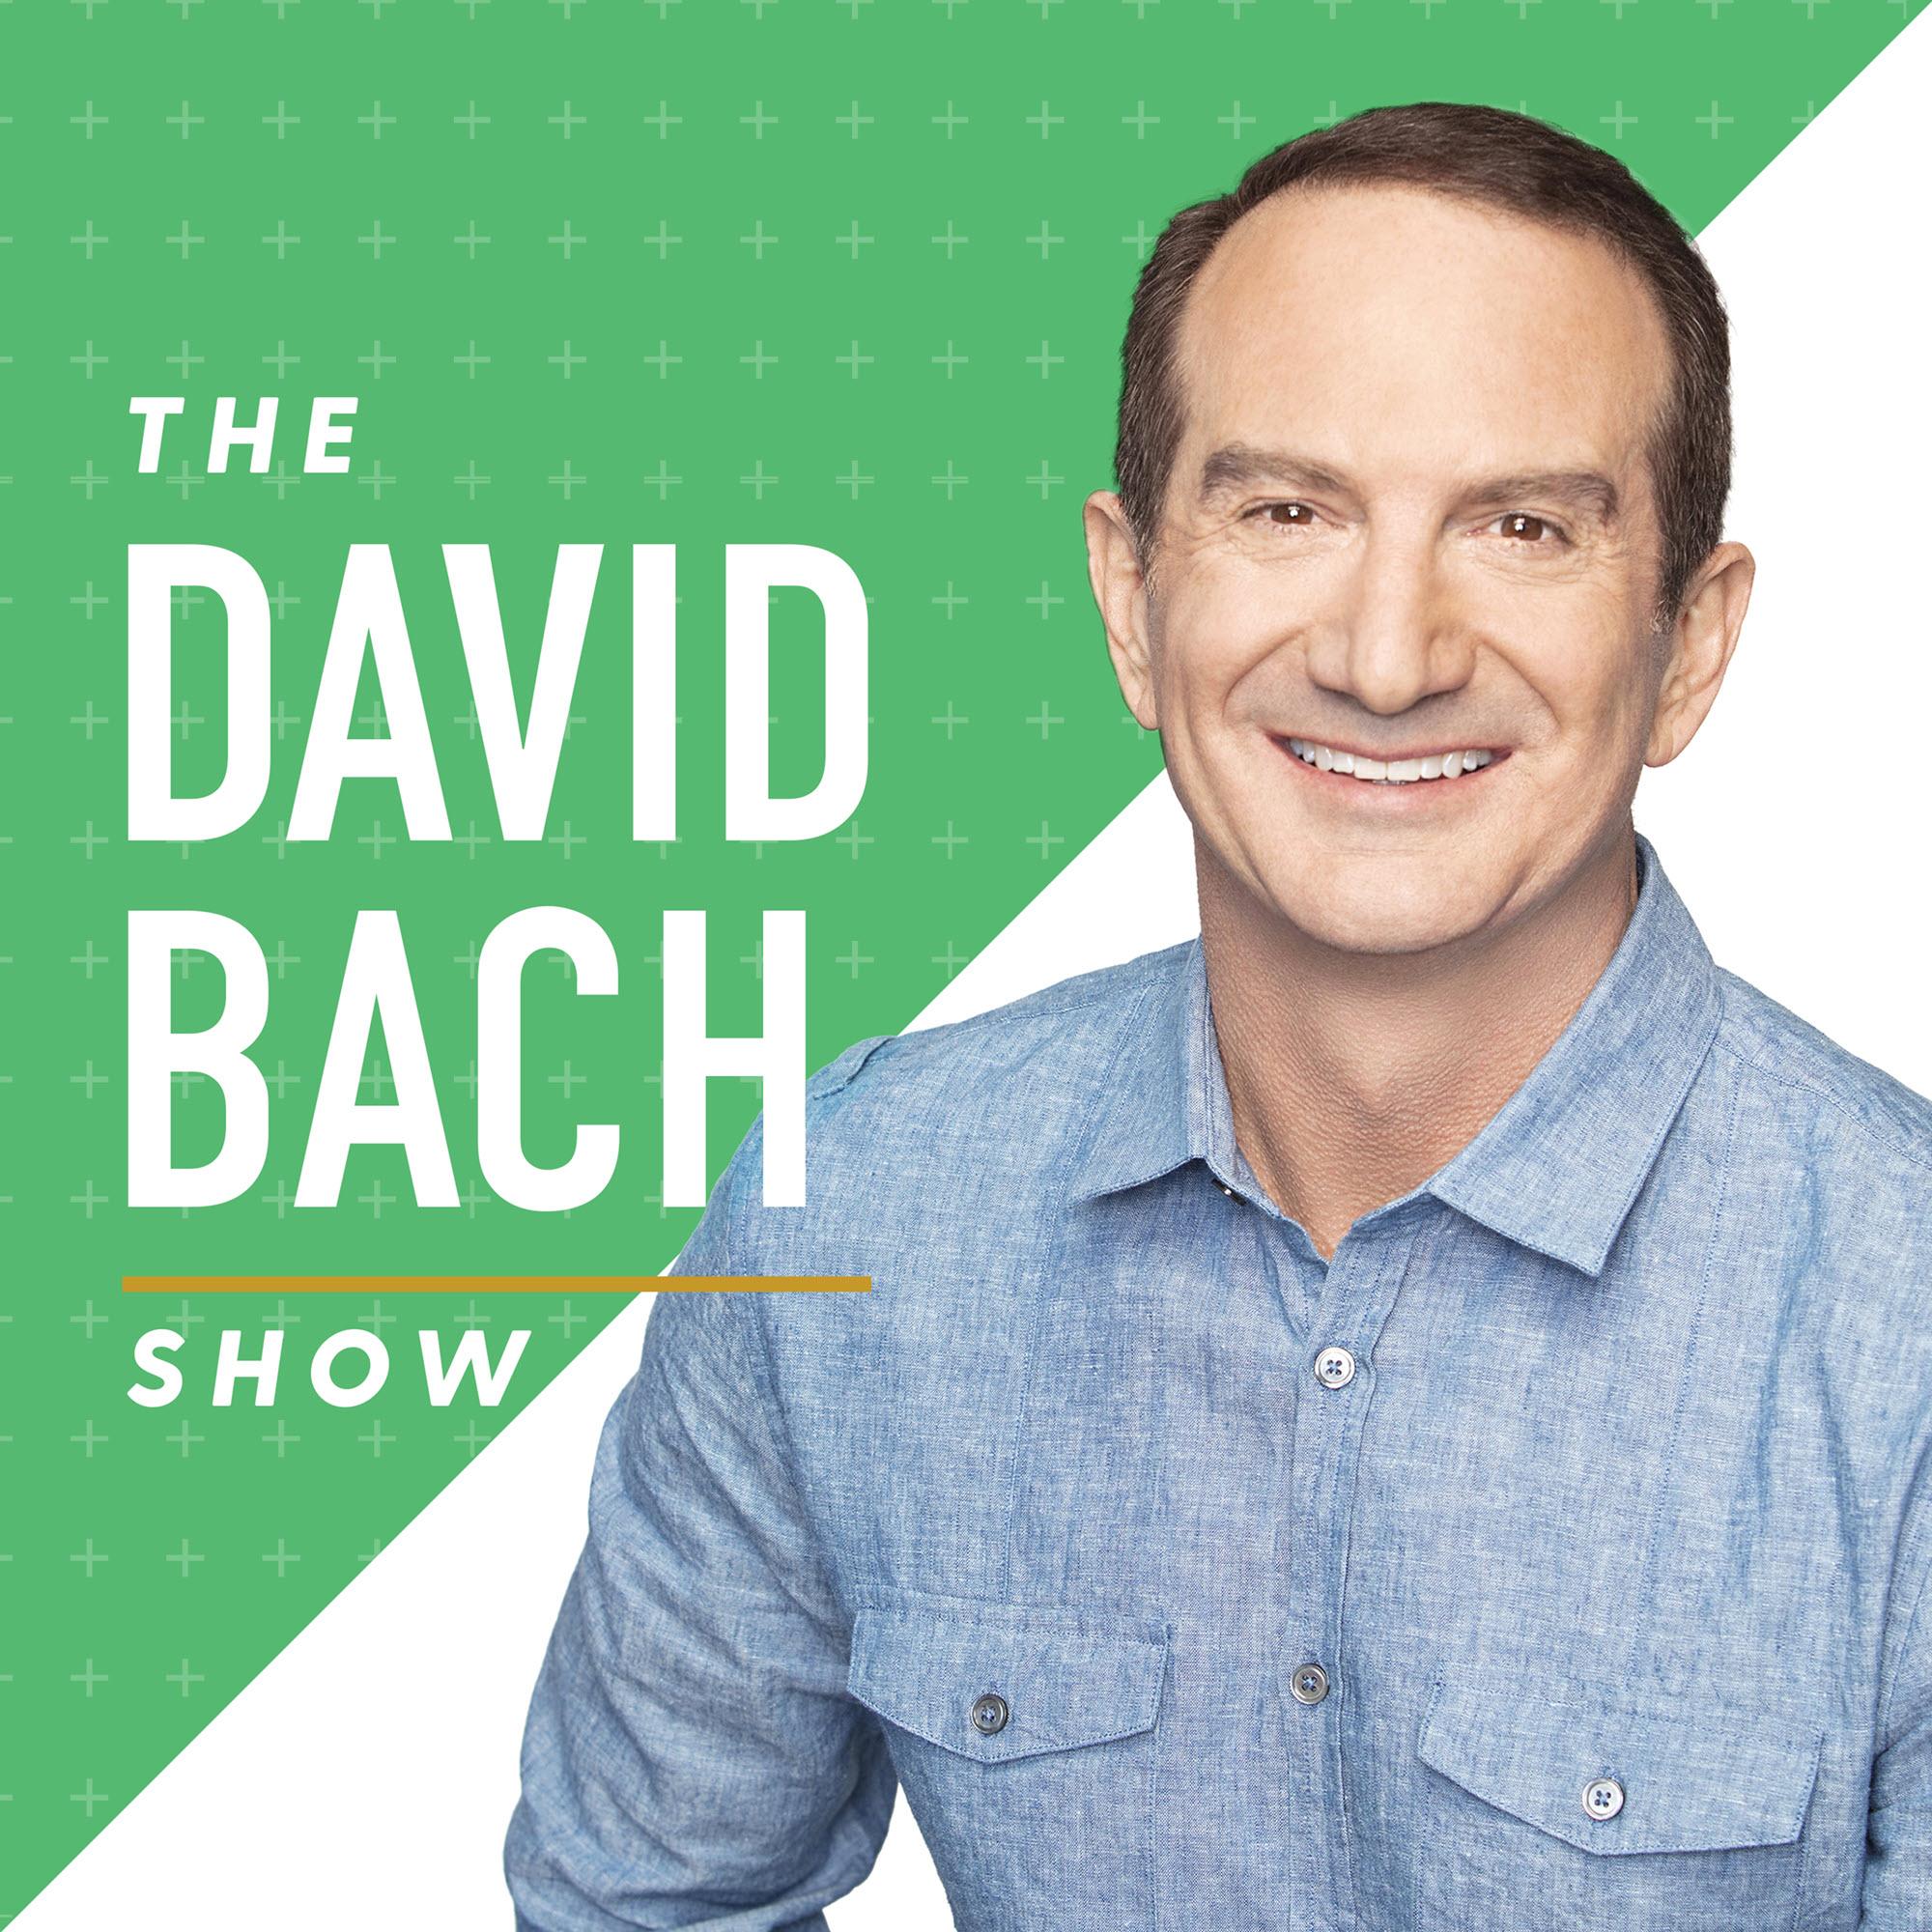 The David Bach Show show art